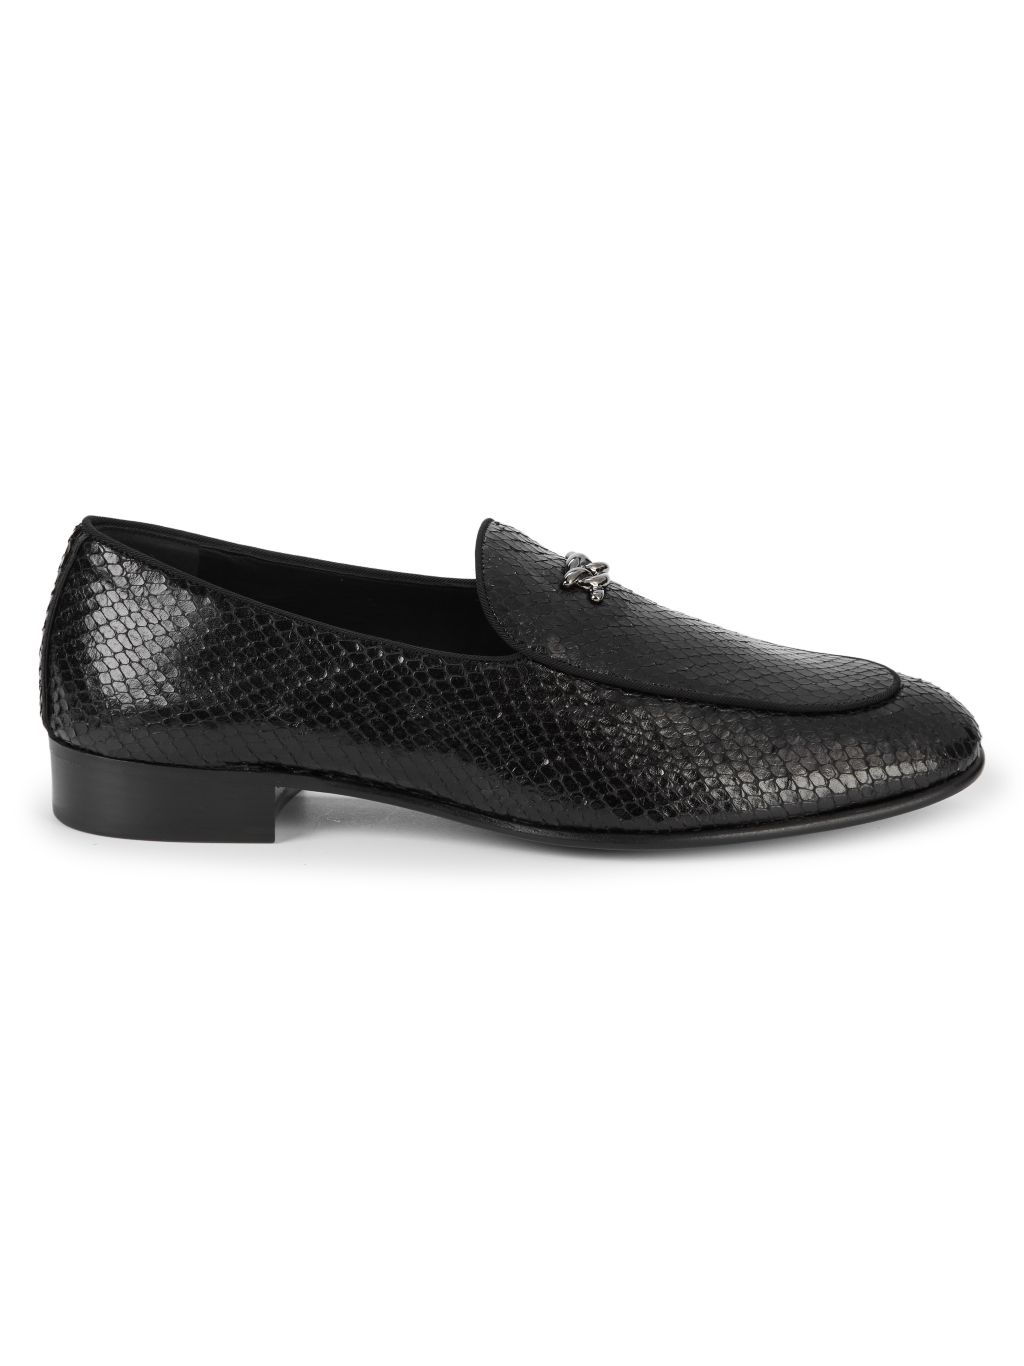 Giuseppe Zanotti Embossed Snake-Print Leather Loafers